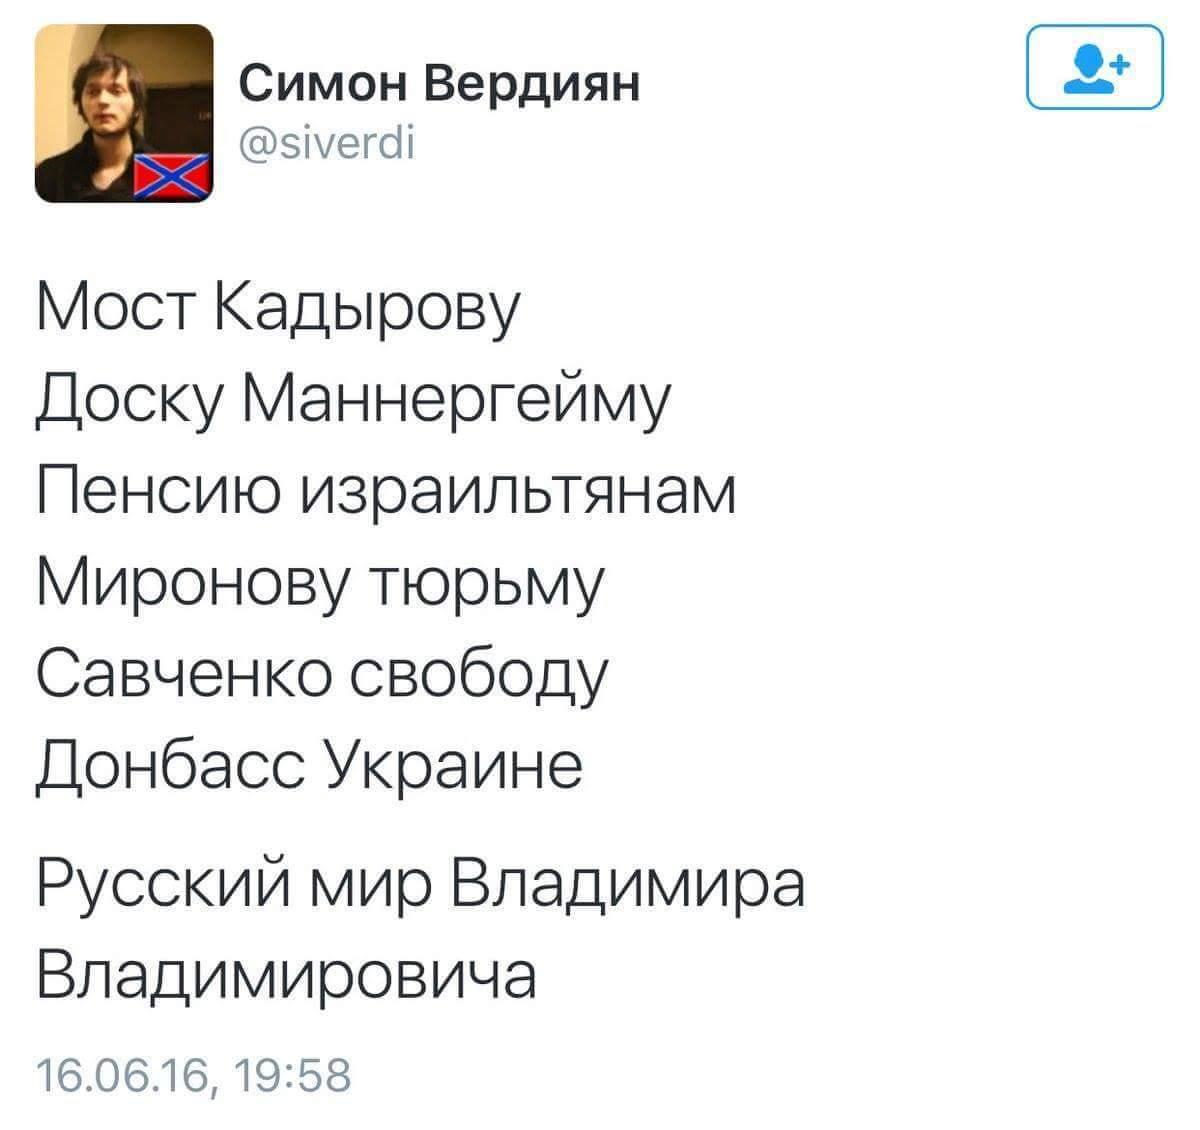 Мост Кадырову, доску Маннергейму